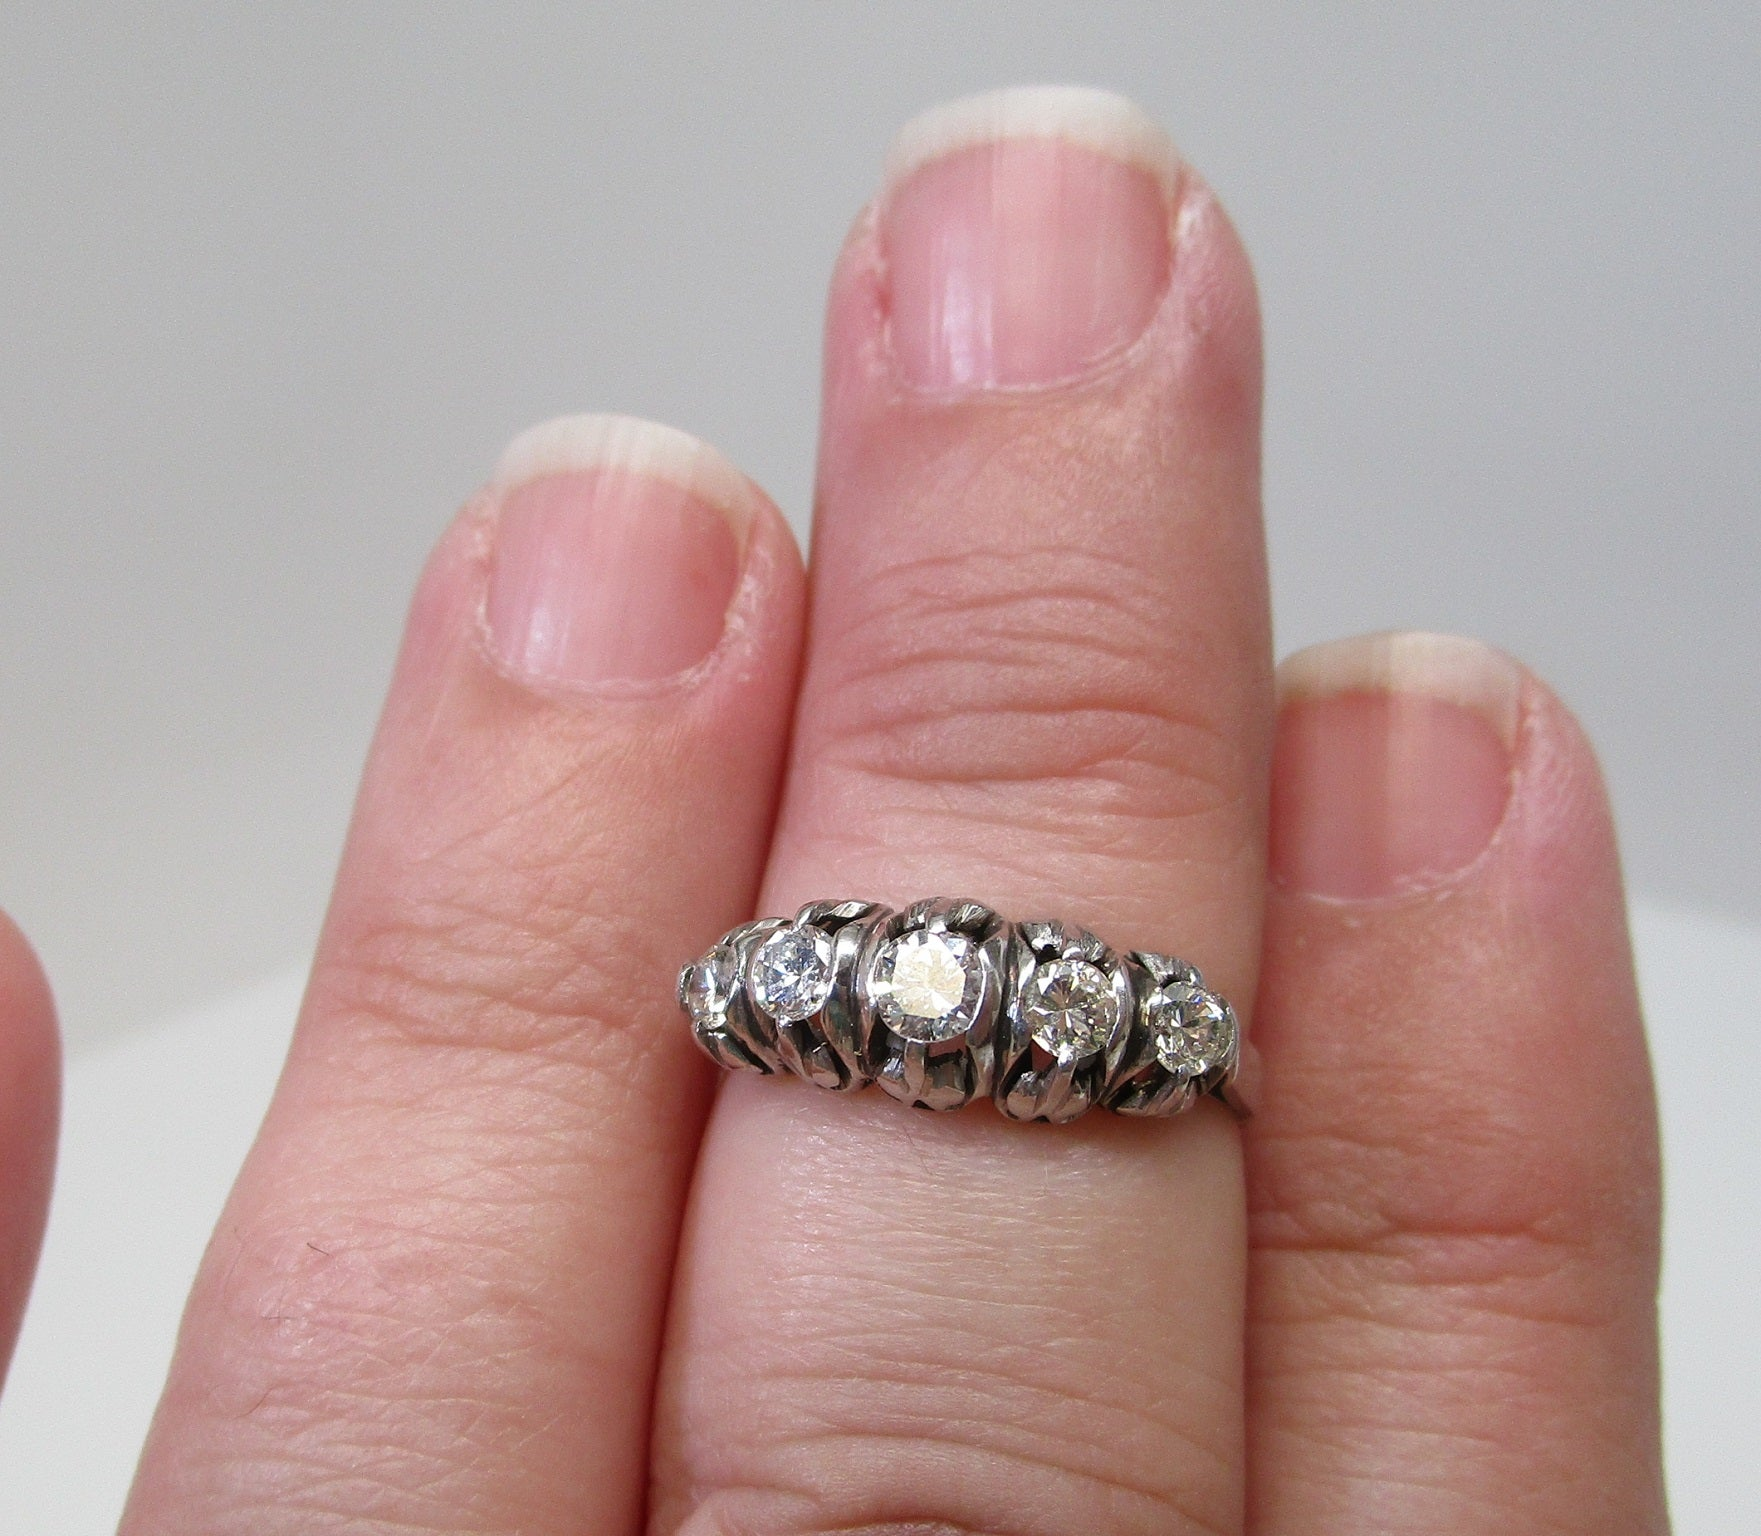 Diamond Platinum Ring, circa 1950 For Sale at 1stdibs